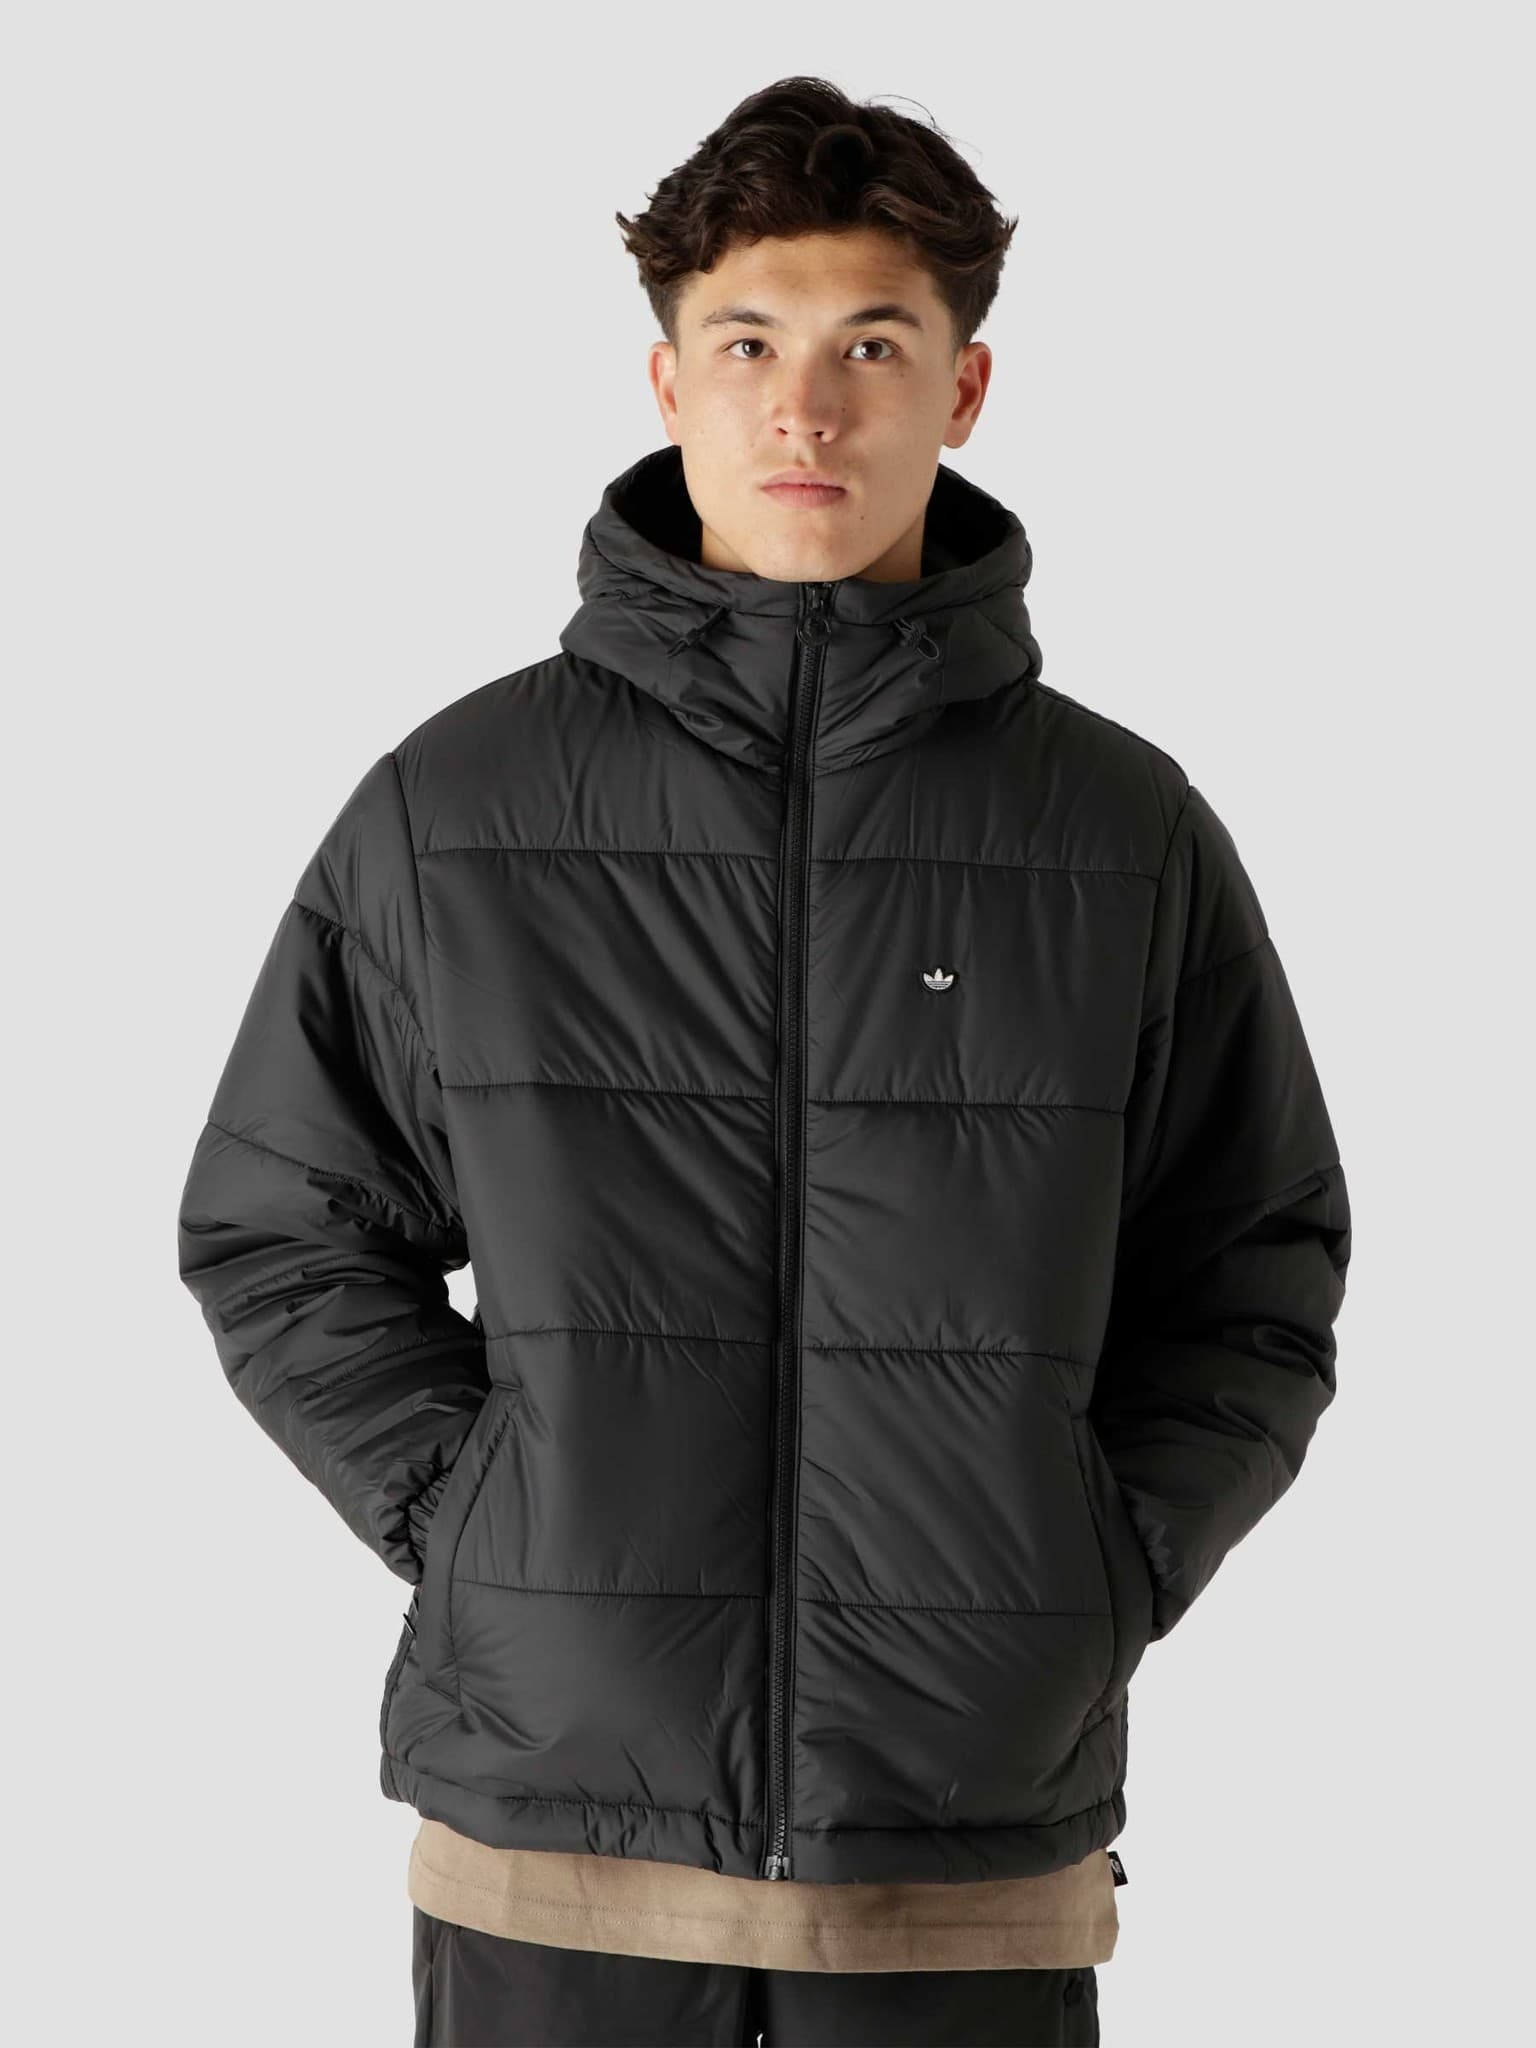 Pad Hooded Puf Black H13555